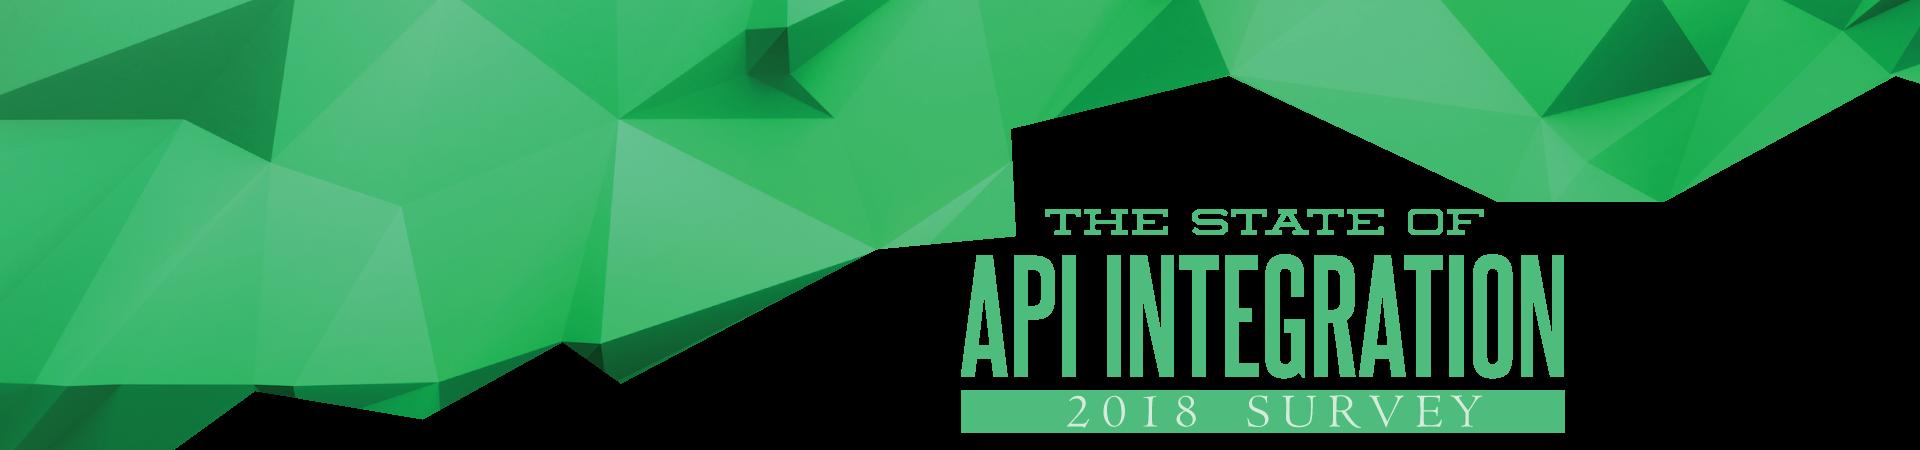 State of API Integration Survey